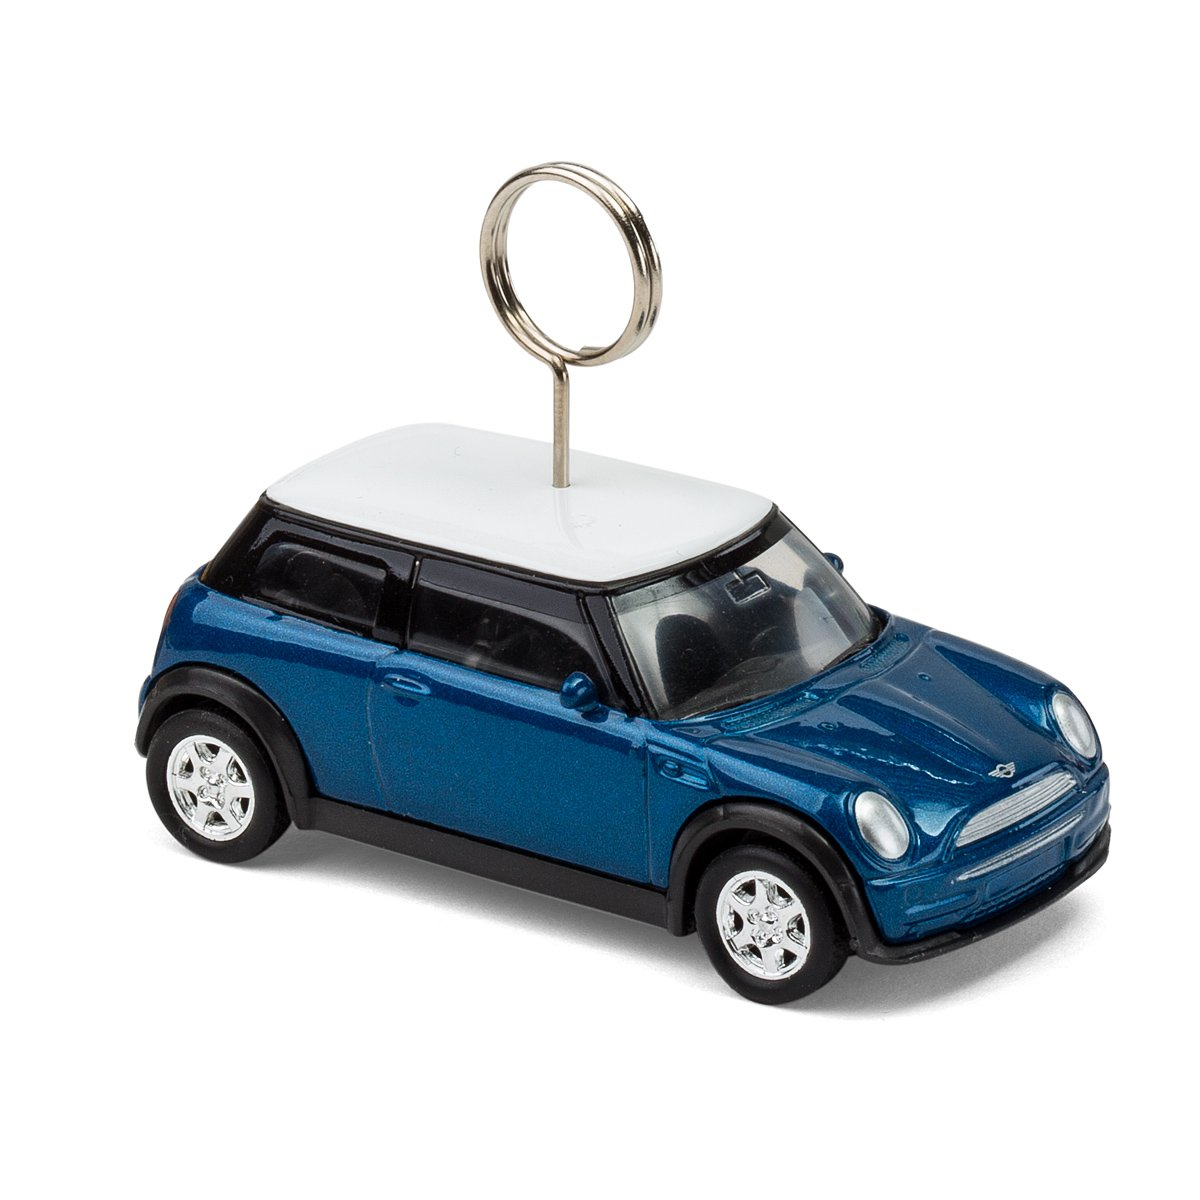 Porte-cartes Sur Roues ? Mini Cooper - bleu corpus delicti